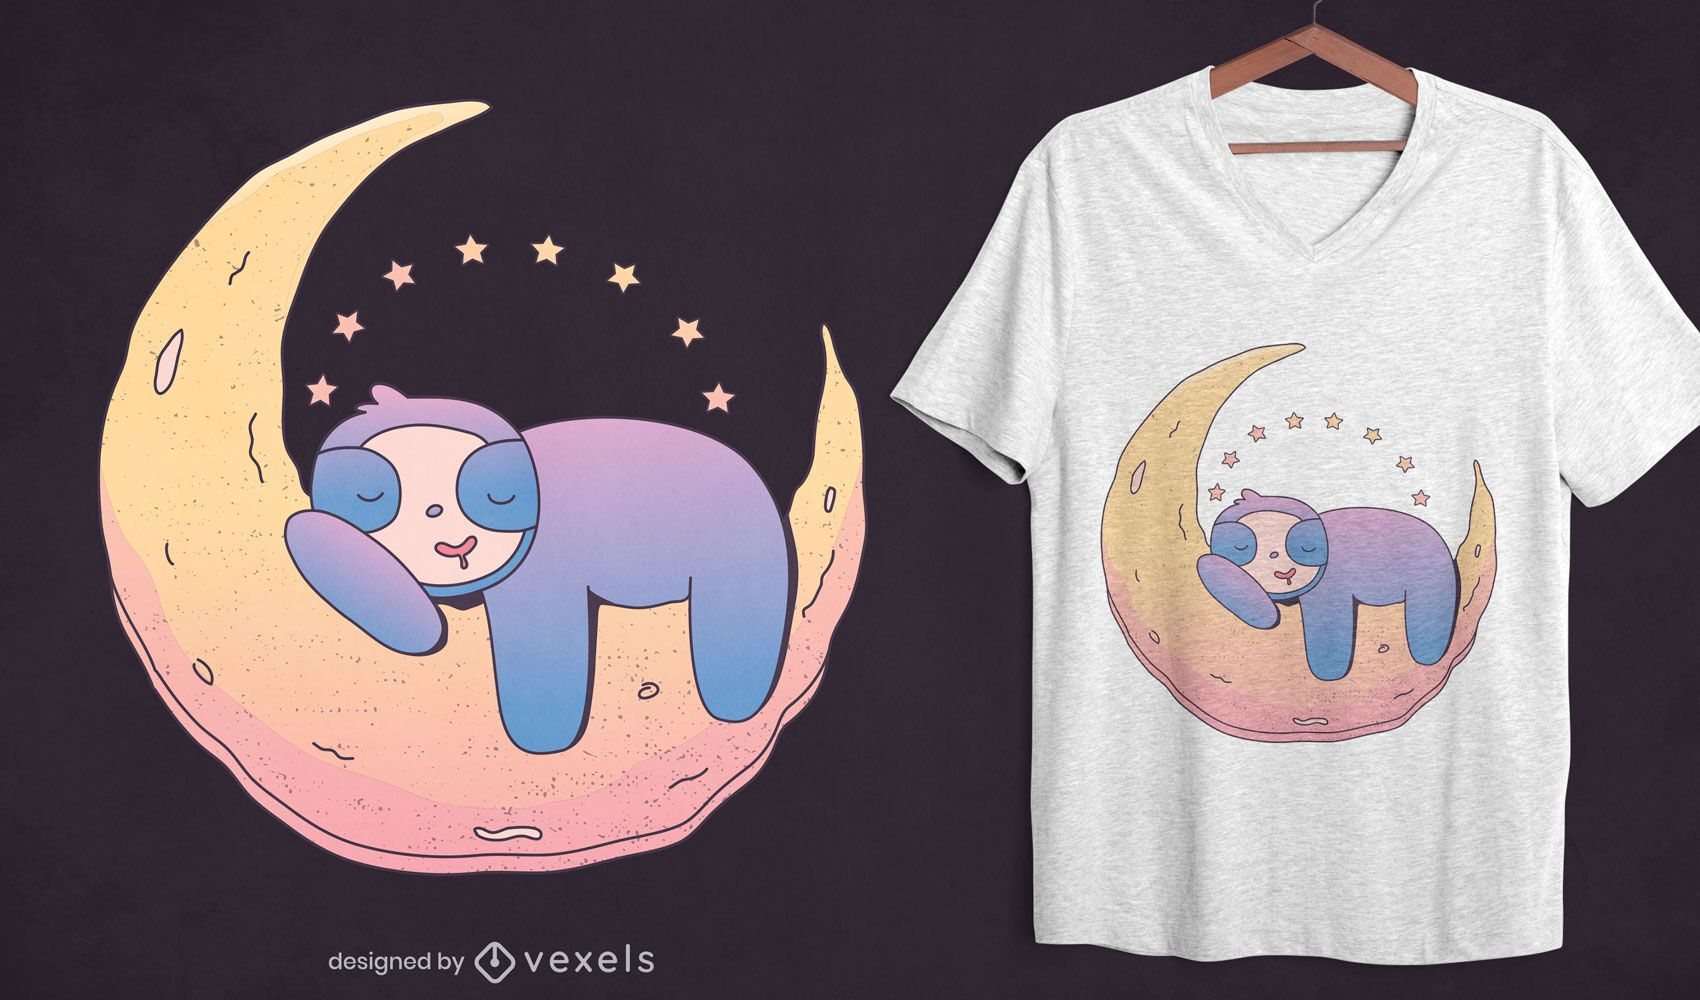 Sloth on moon t-shirt design